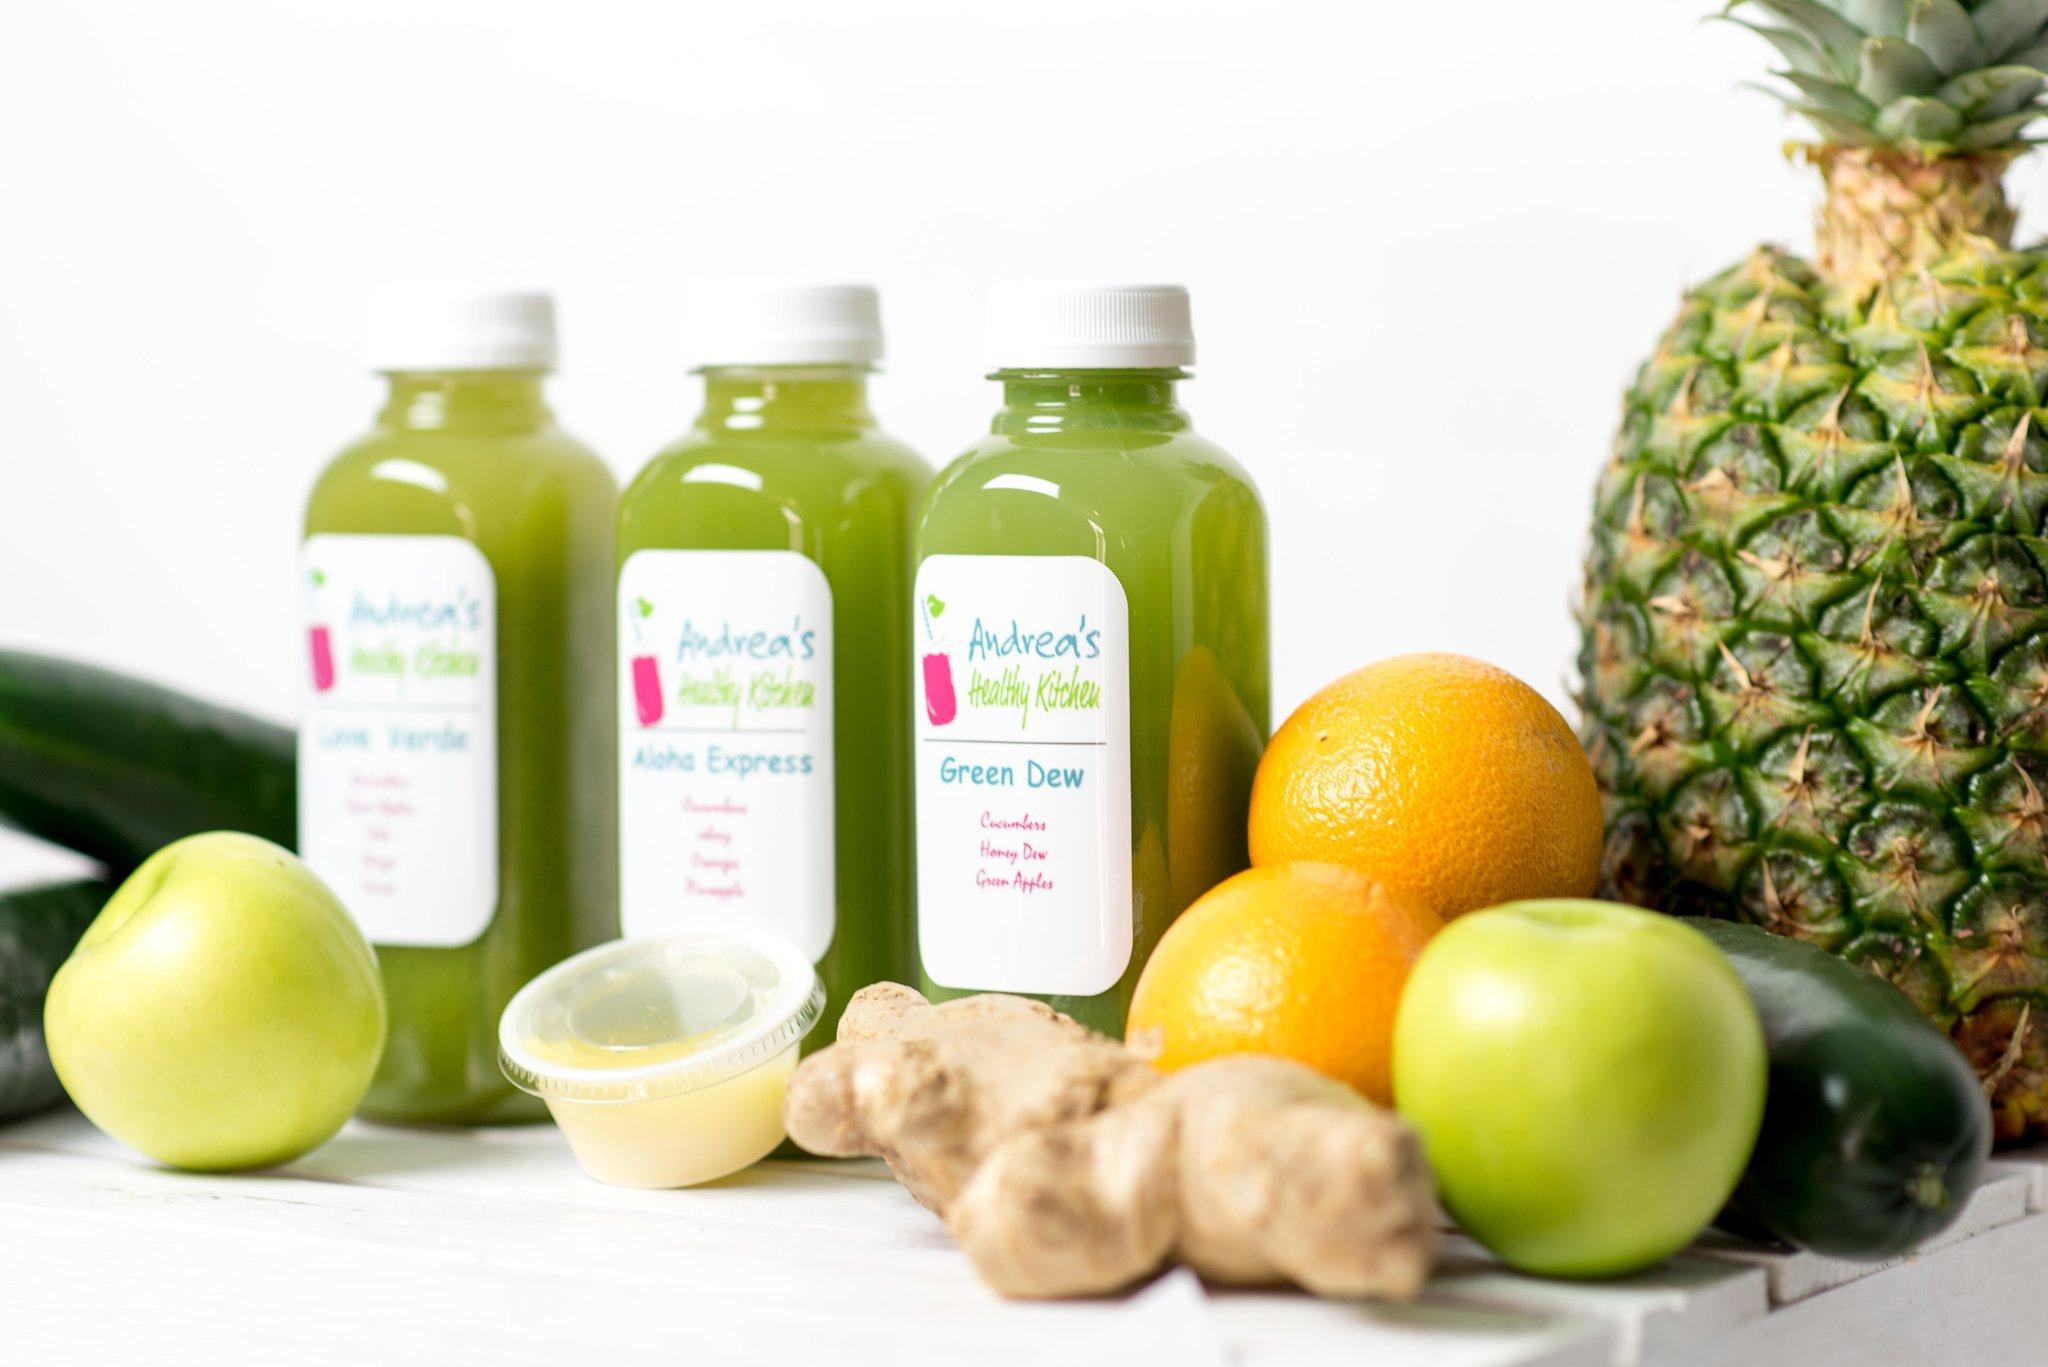 detox-green-juices-12_1_fed429eb-6243-4335-9f87-5deacc372807_1024x1024@2x.jpg